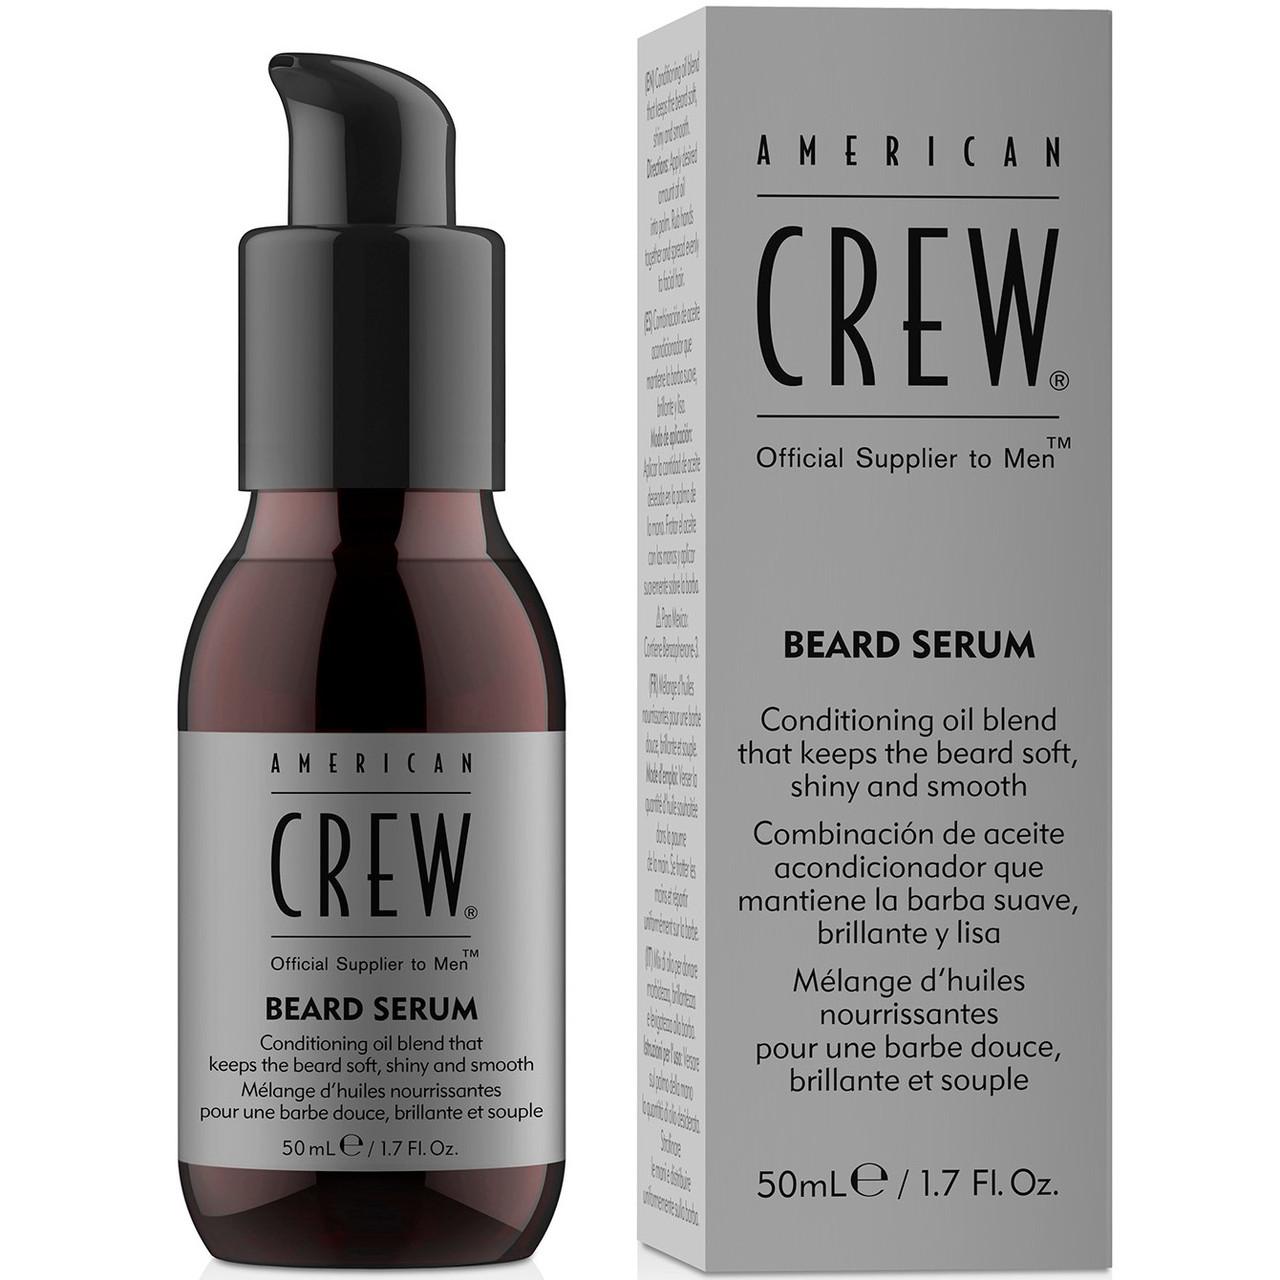 American Crew Beard Serum - Сыворотка для бороды, 50 ml